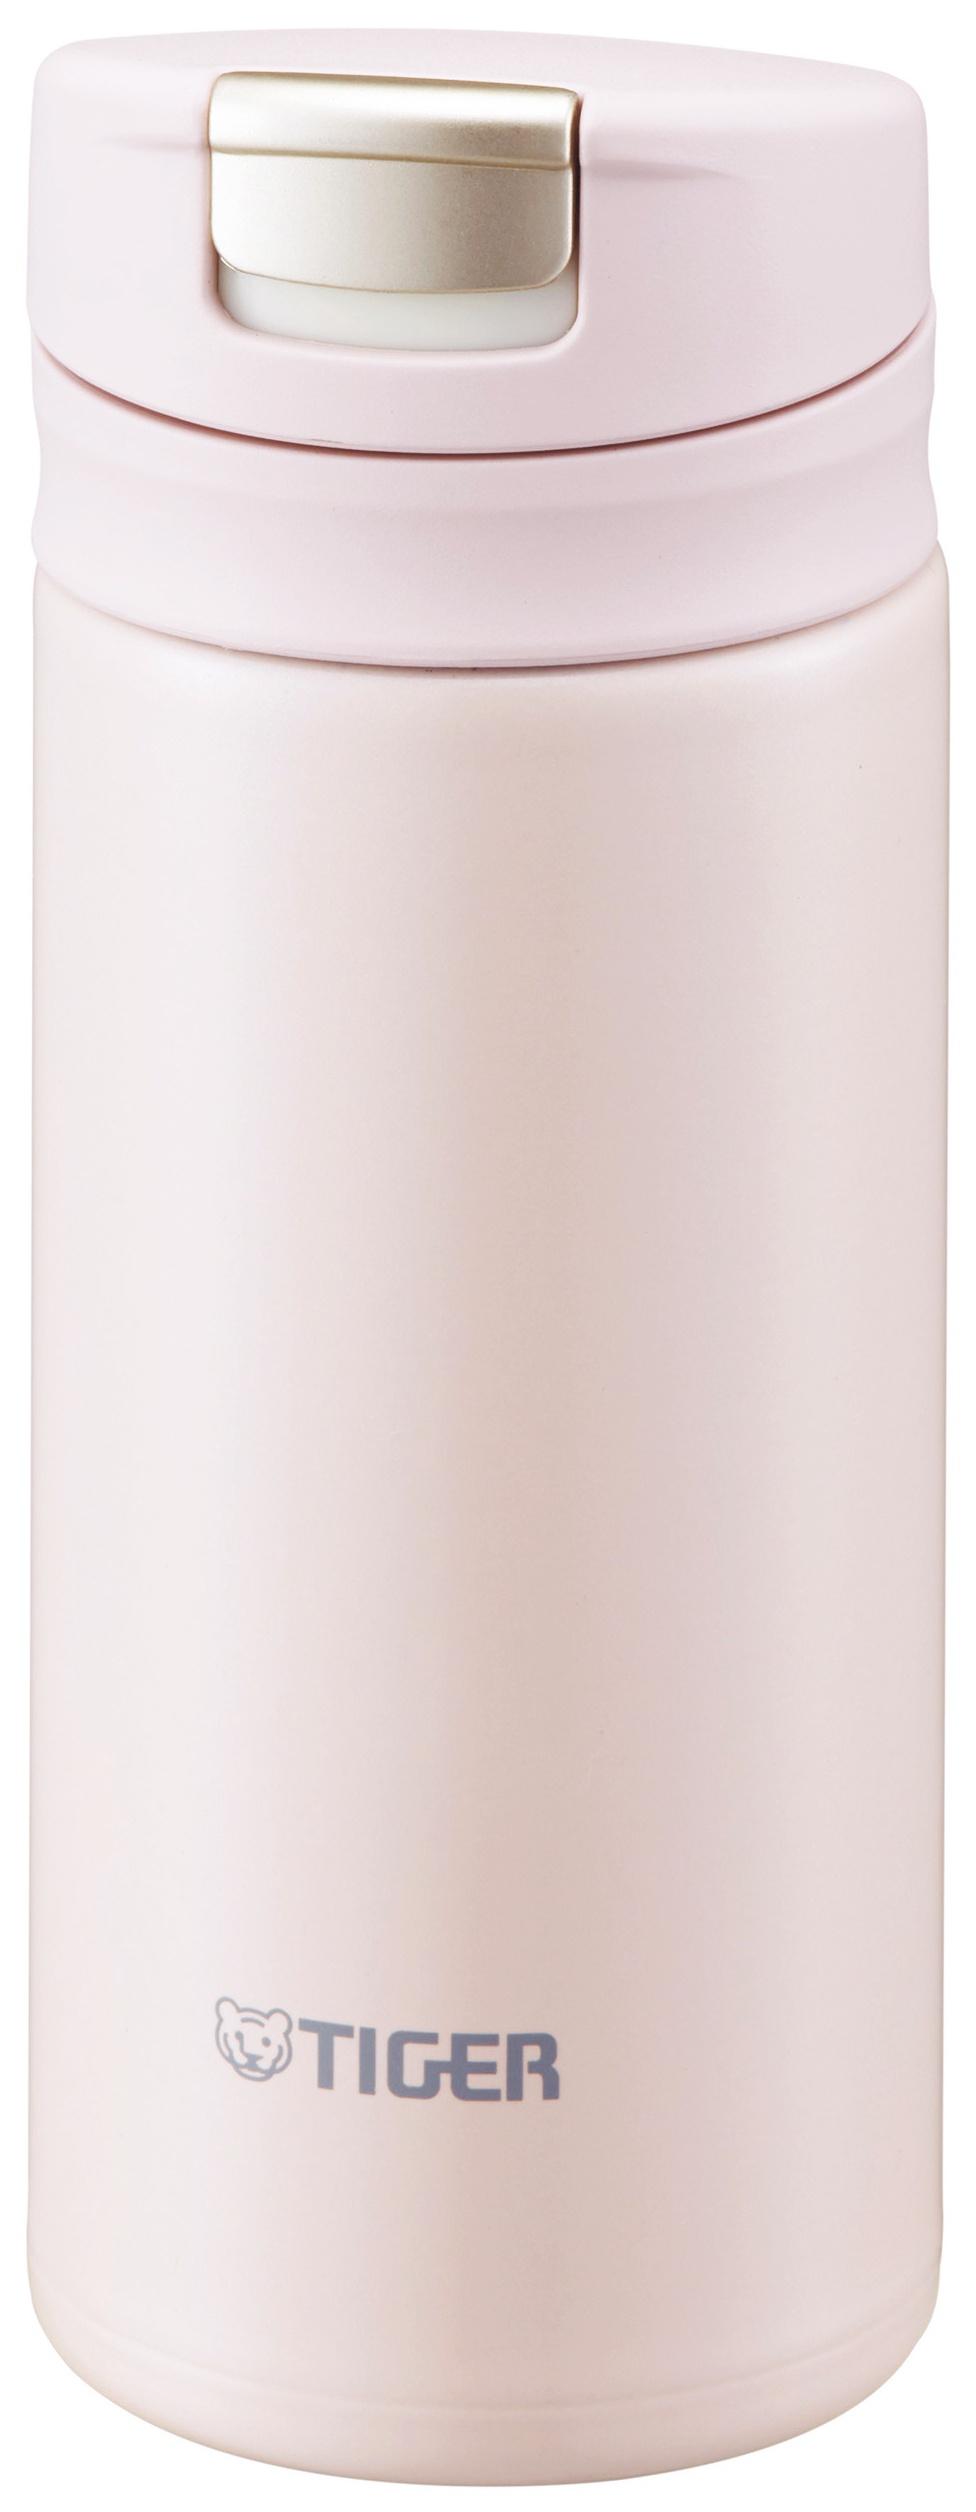 Термокружка Tiger MMX-A020 PP, пудрово-розовый, 200 мл